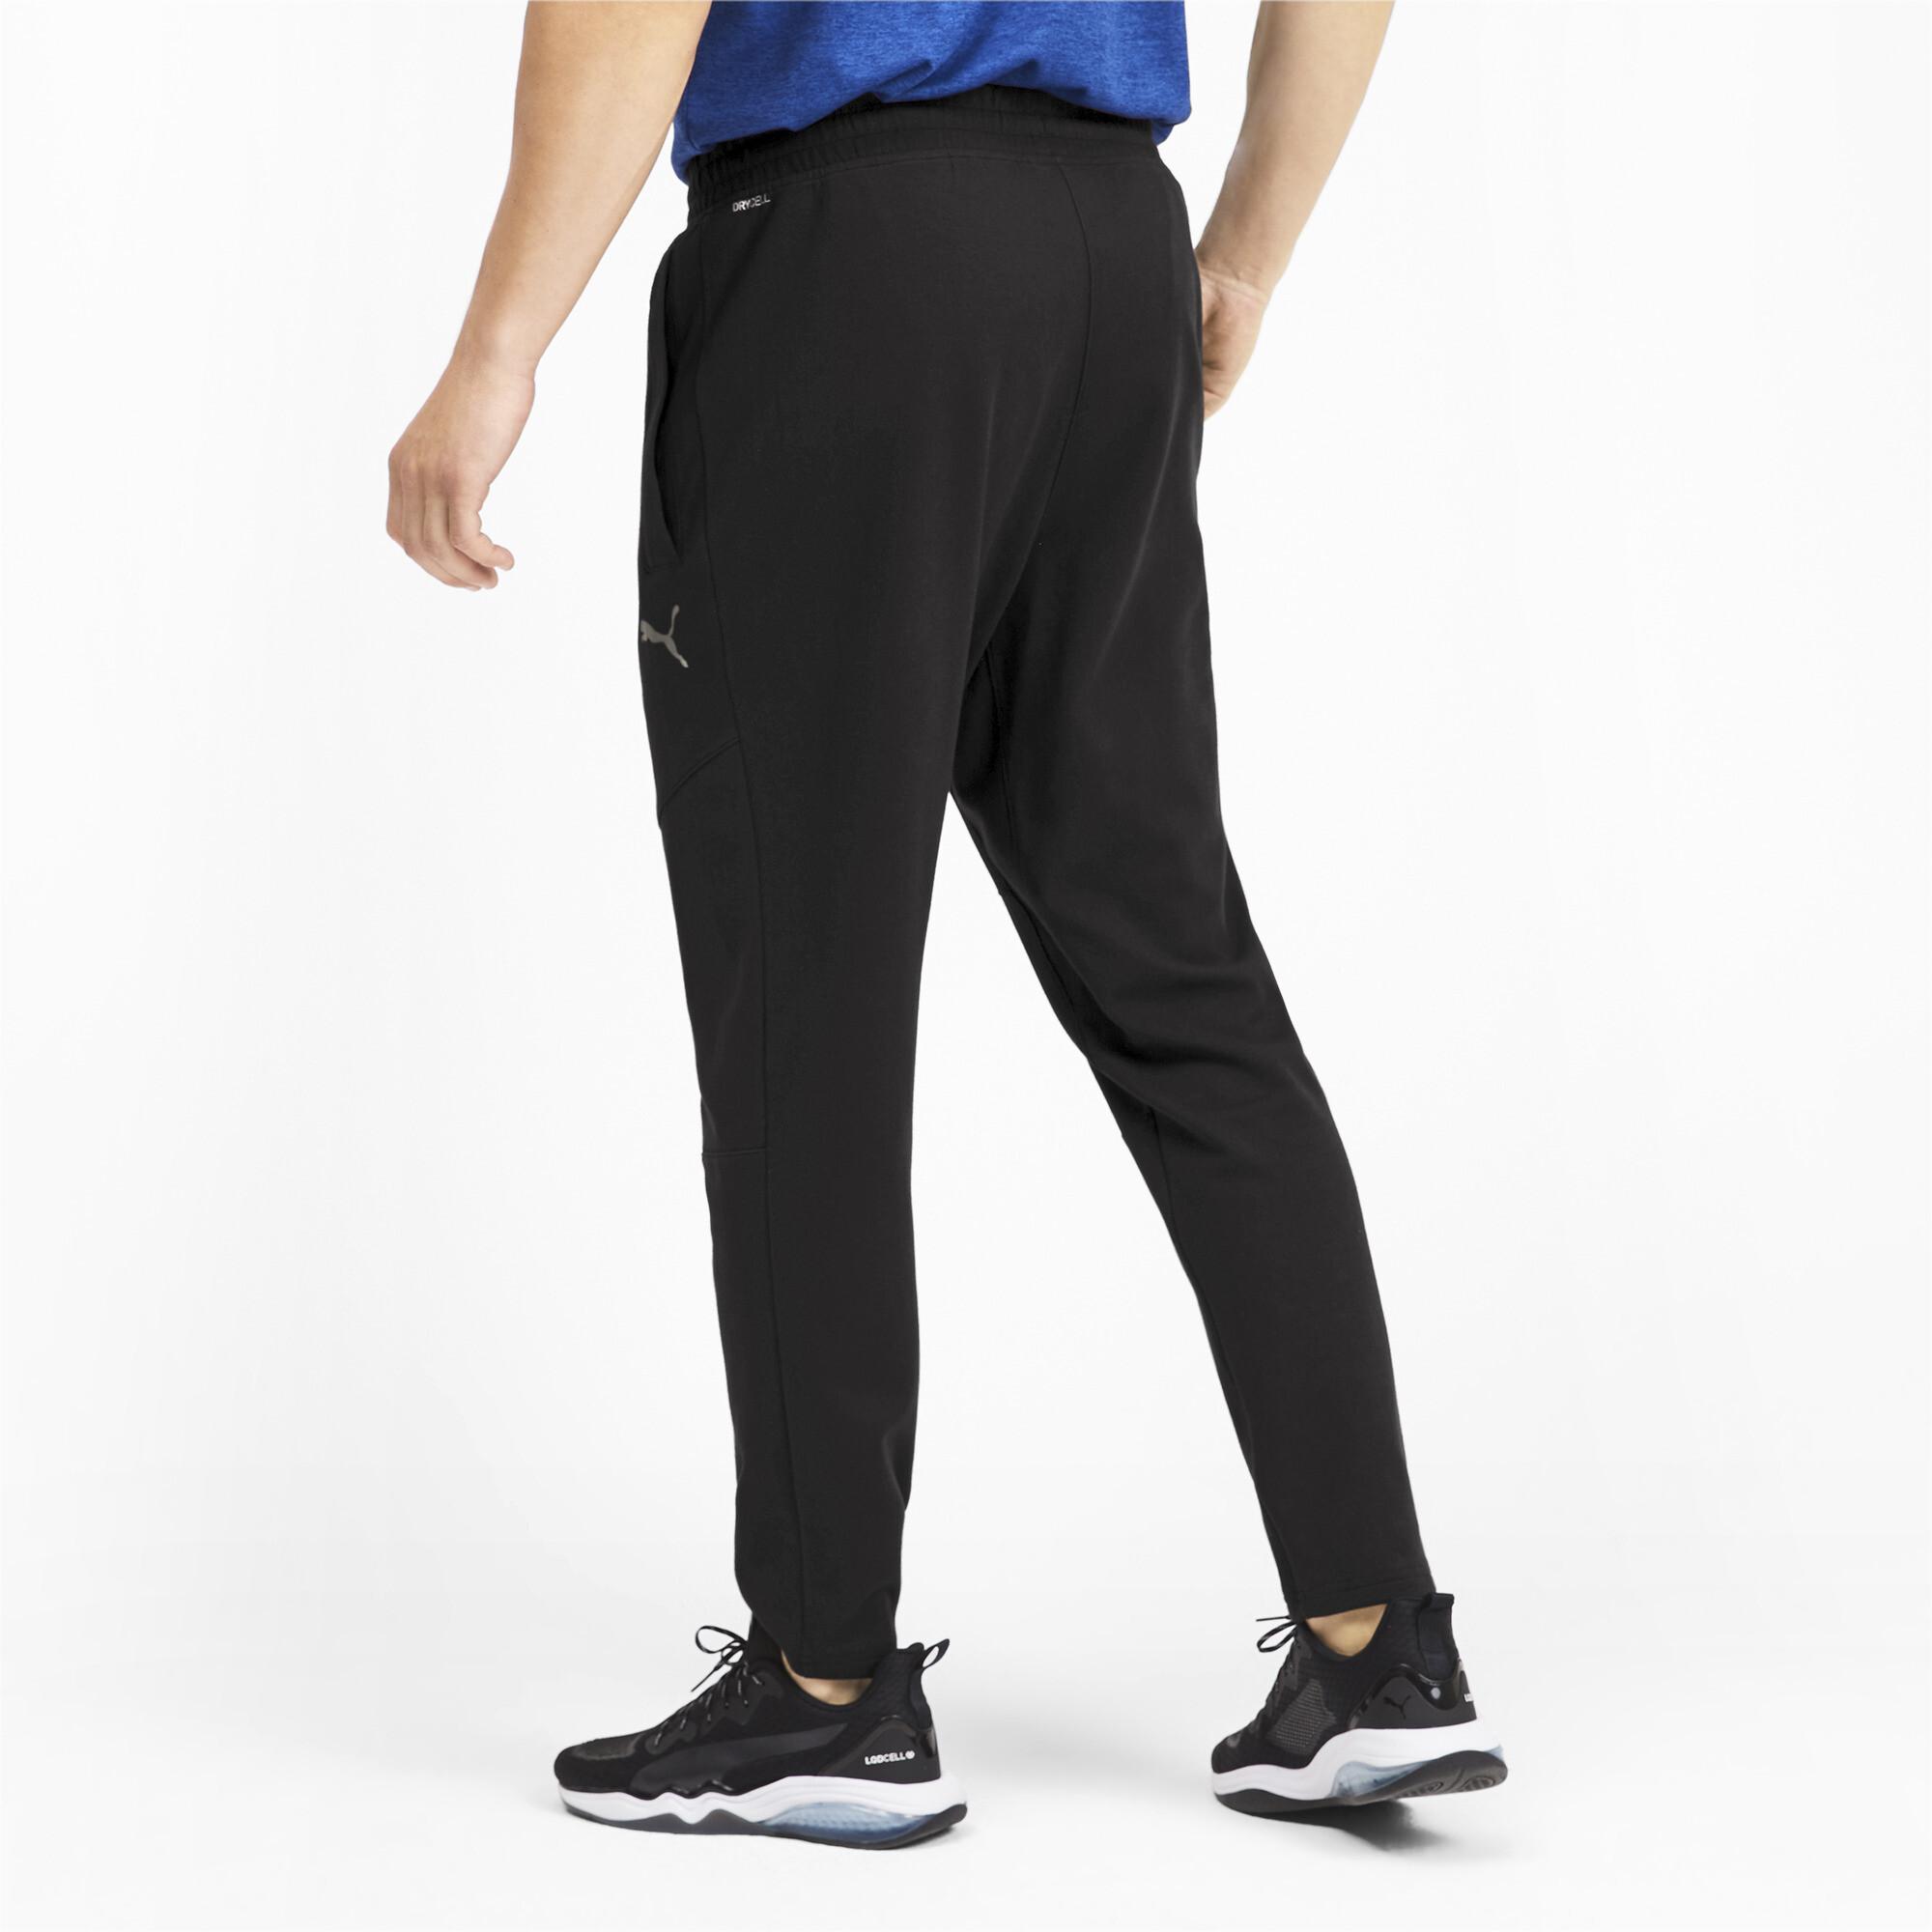 PUMA-Reactive-Trackster-Men-039-s-Training-Pants-Men-Knitted-Pants-Training thumbnail 5